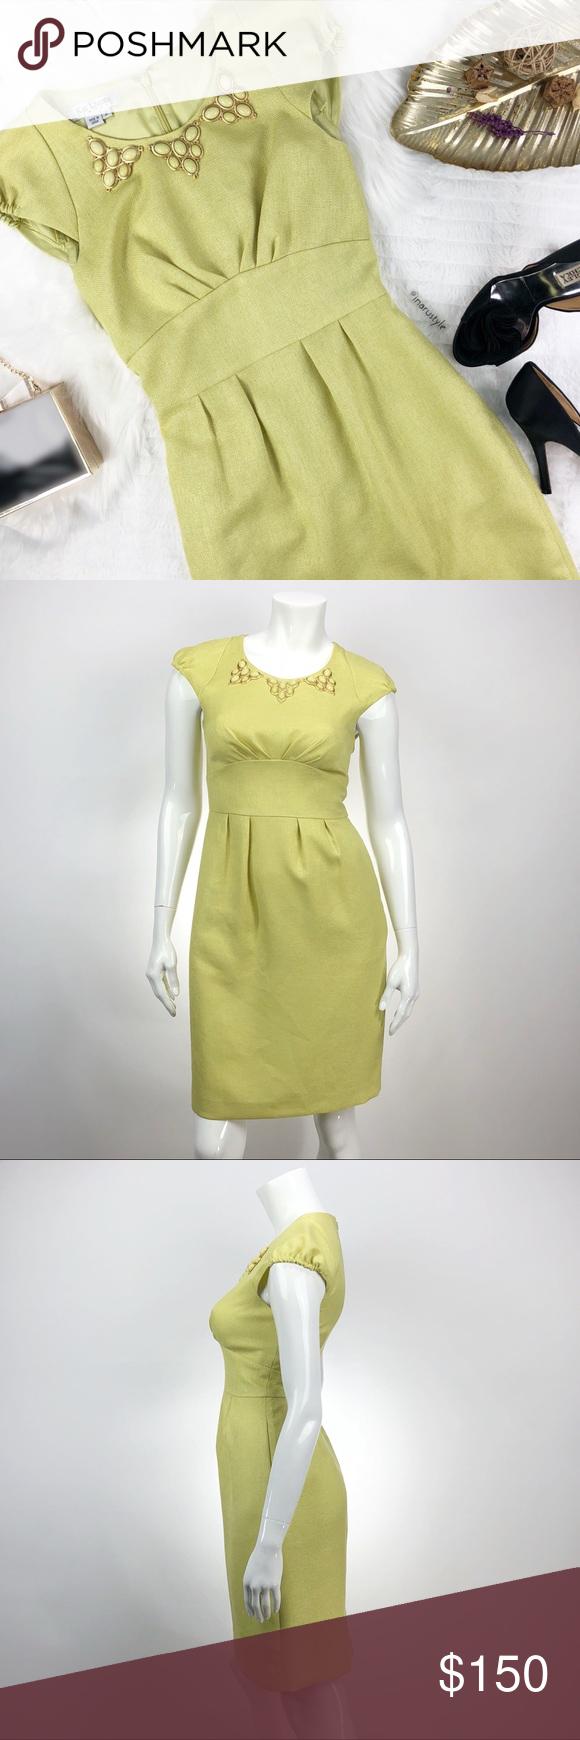 Kay unger ny lime green shift dress size my posh picks